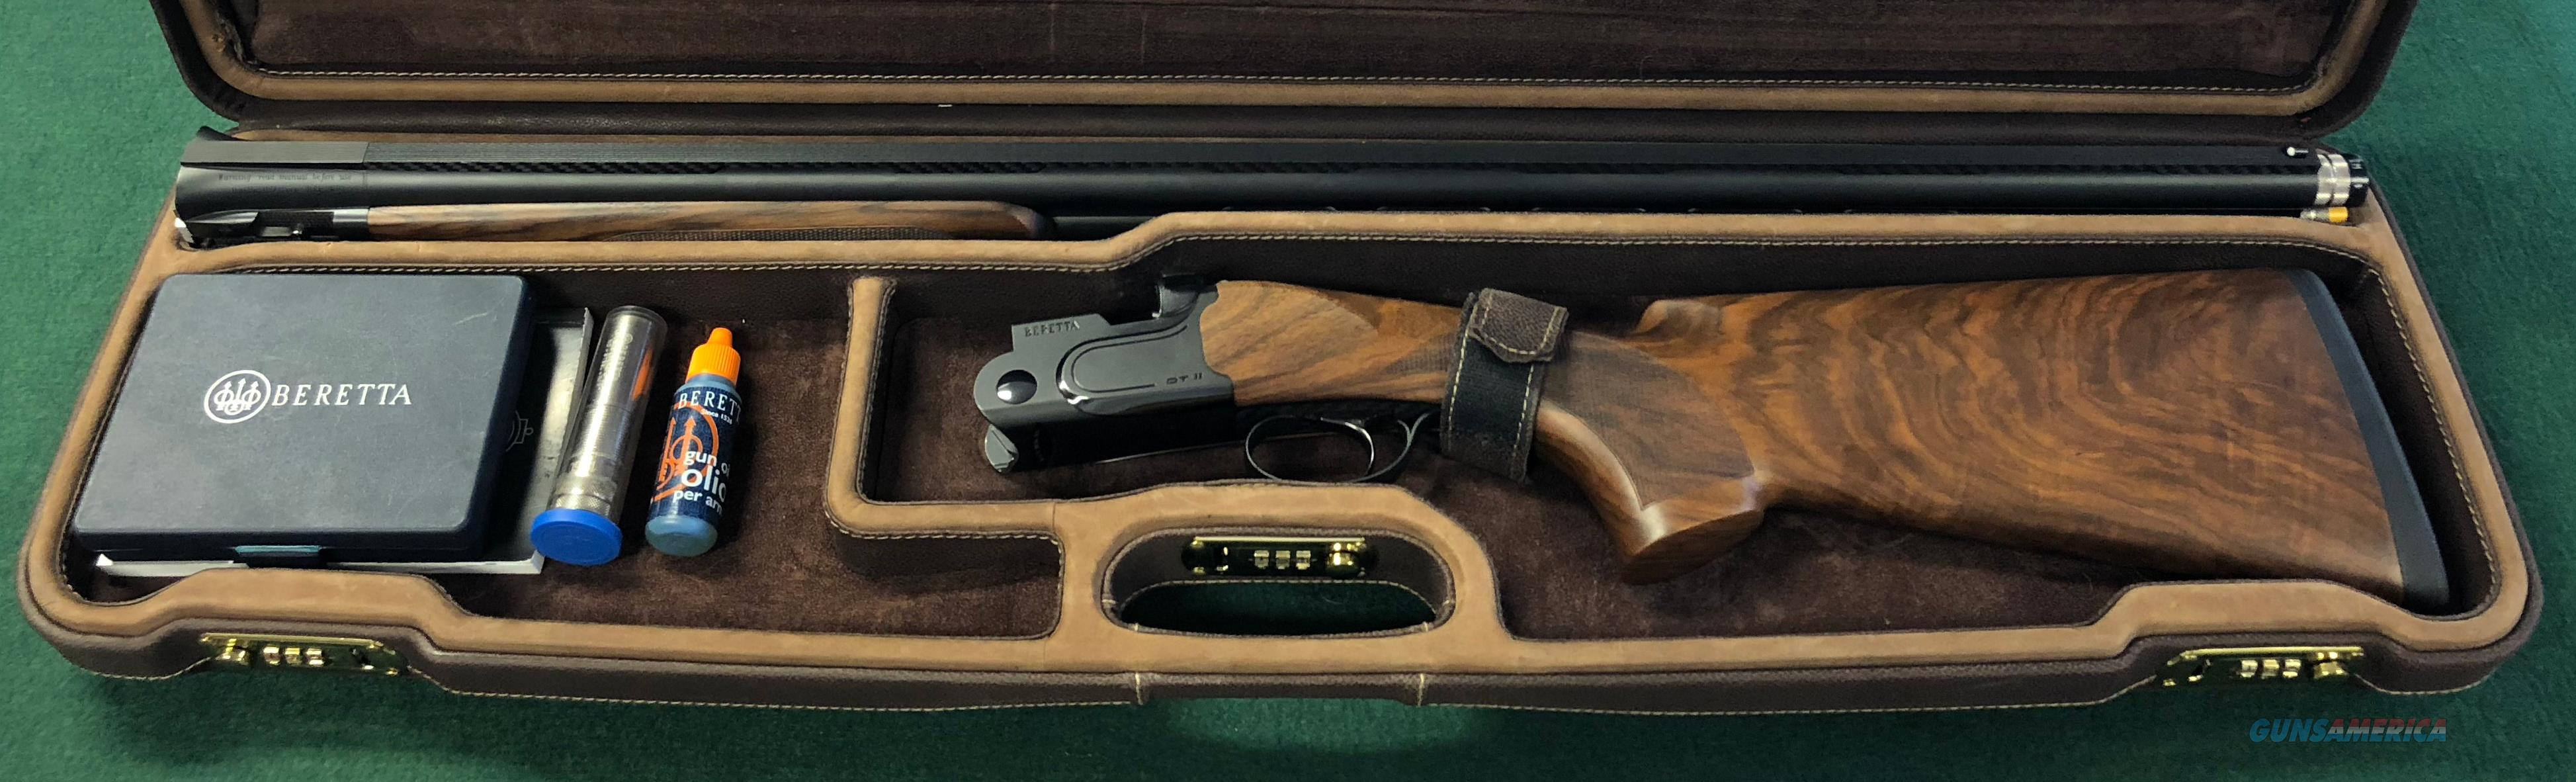 Beretta DT11 Sporting Black Edition  Guns > Shotguns > Beretta Shotguns > O/U > Trap/Skeet